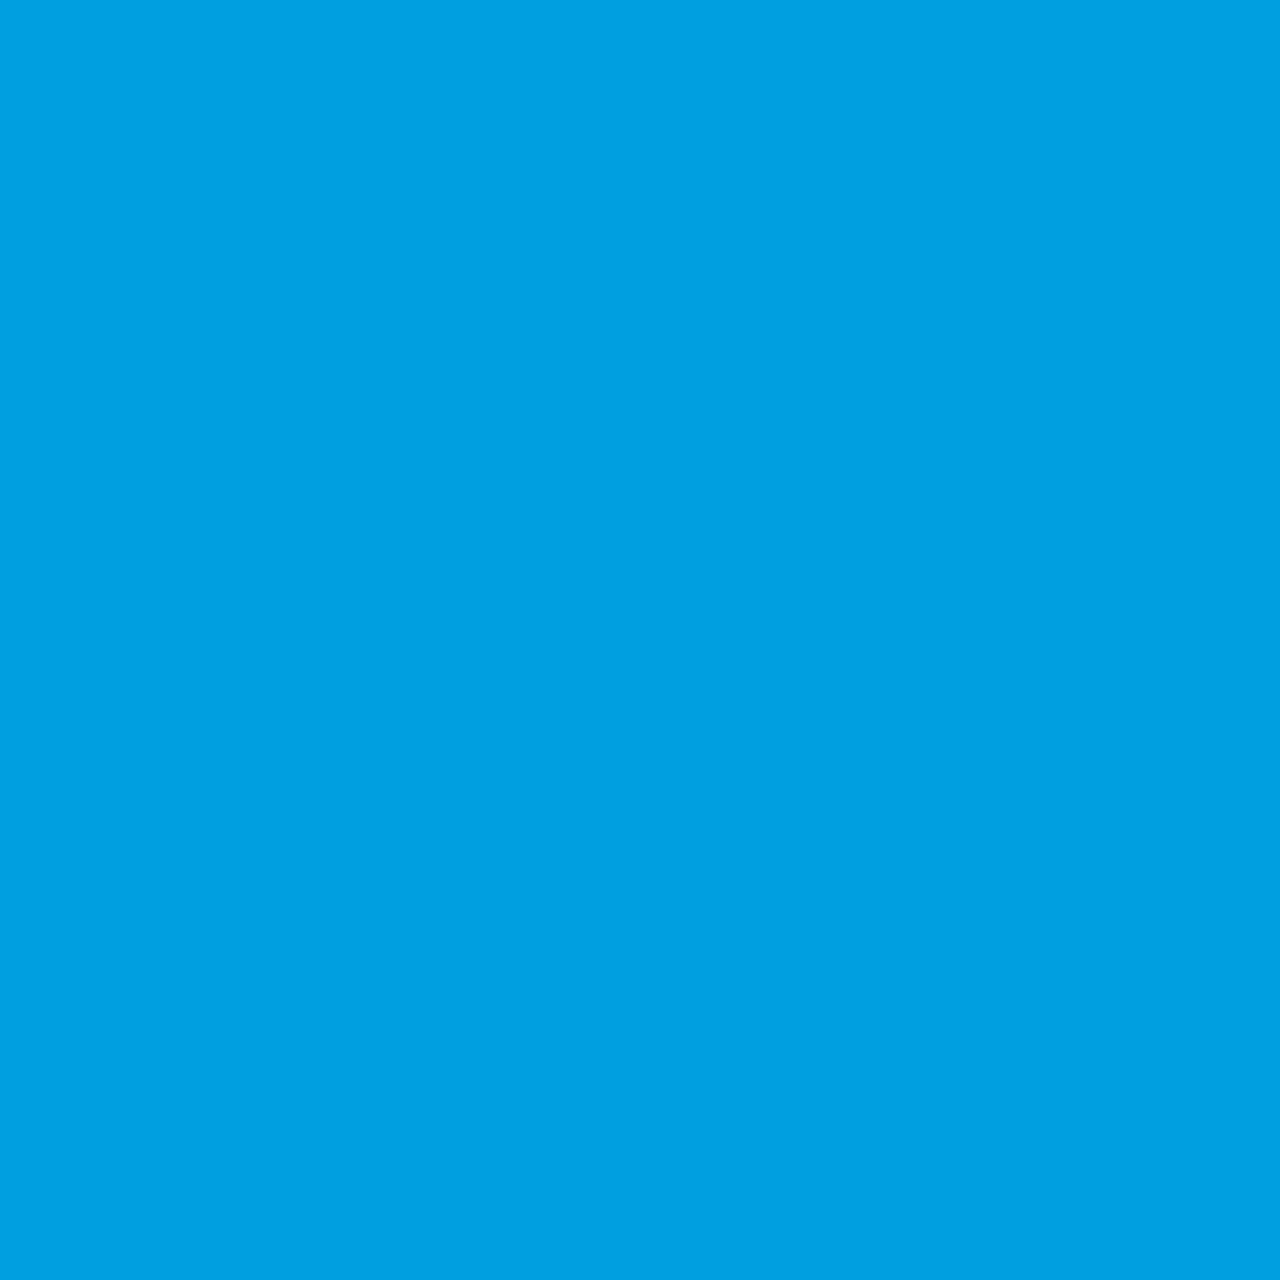 PMS 299C Light blue (primary)